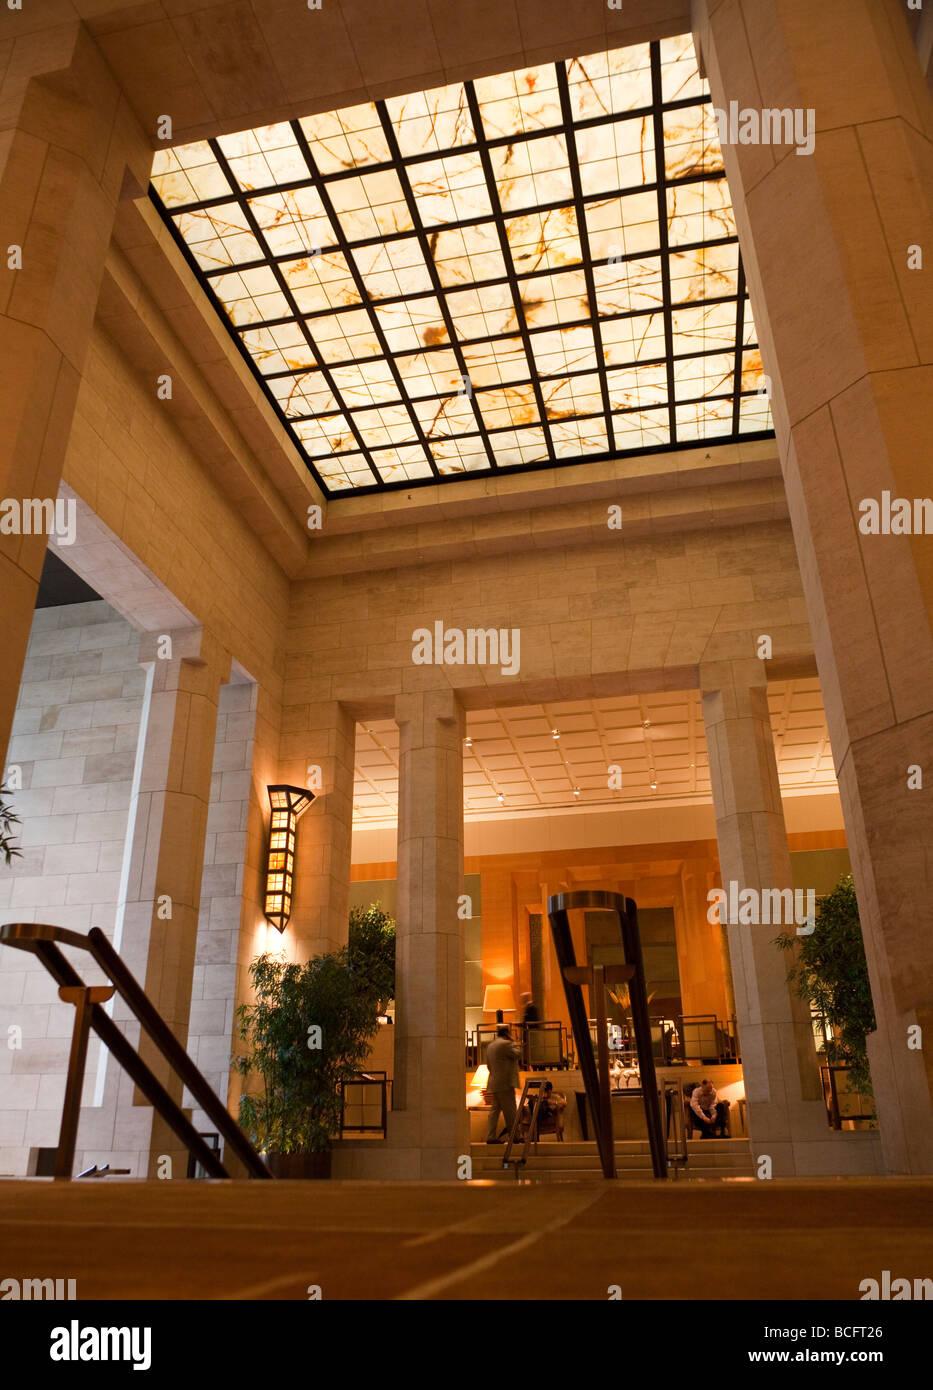 Lobby Four Seasons Hotel New York City Usa Stock Photo Alamy